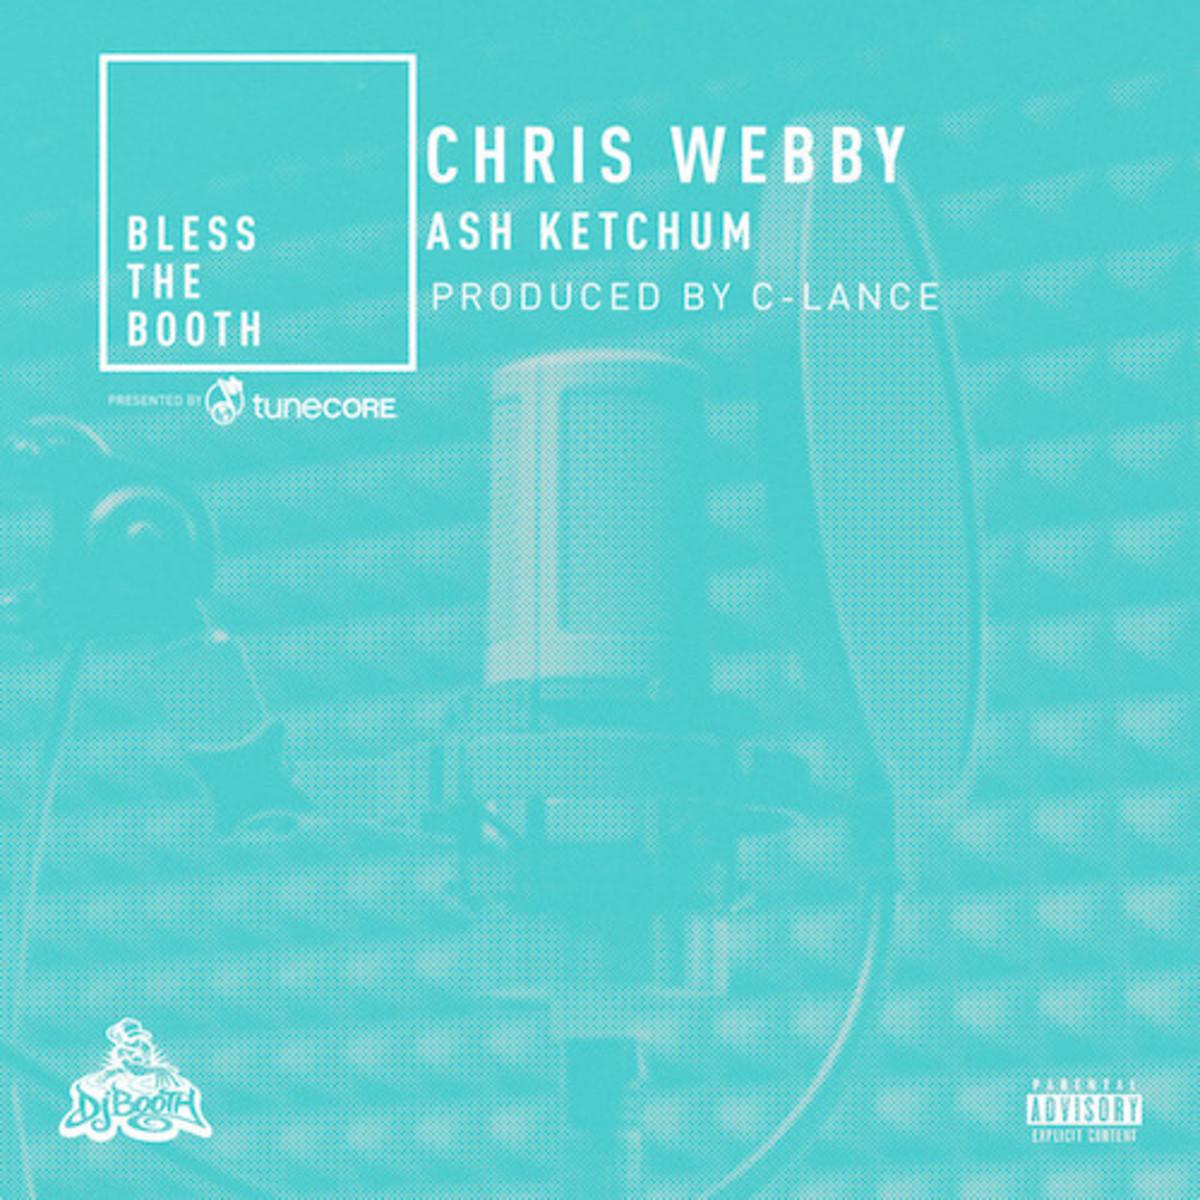 chris-webby-ash-ketchum.jpg